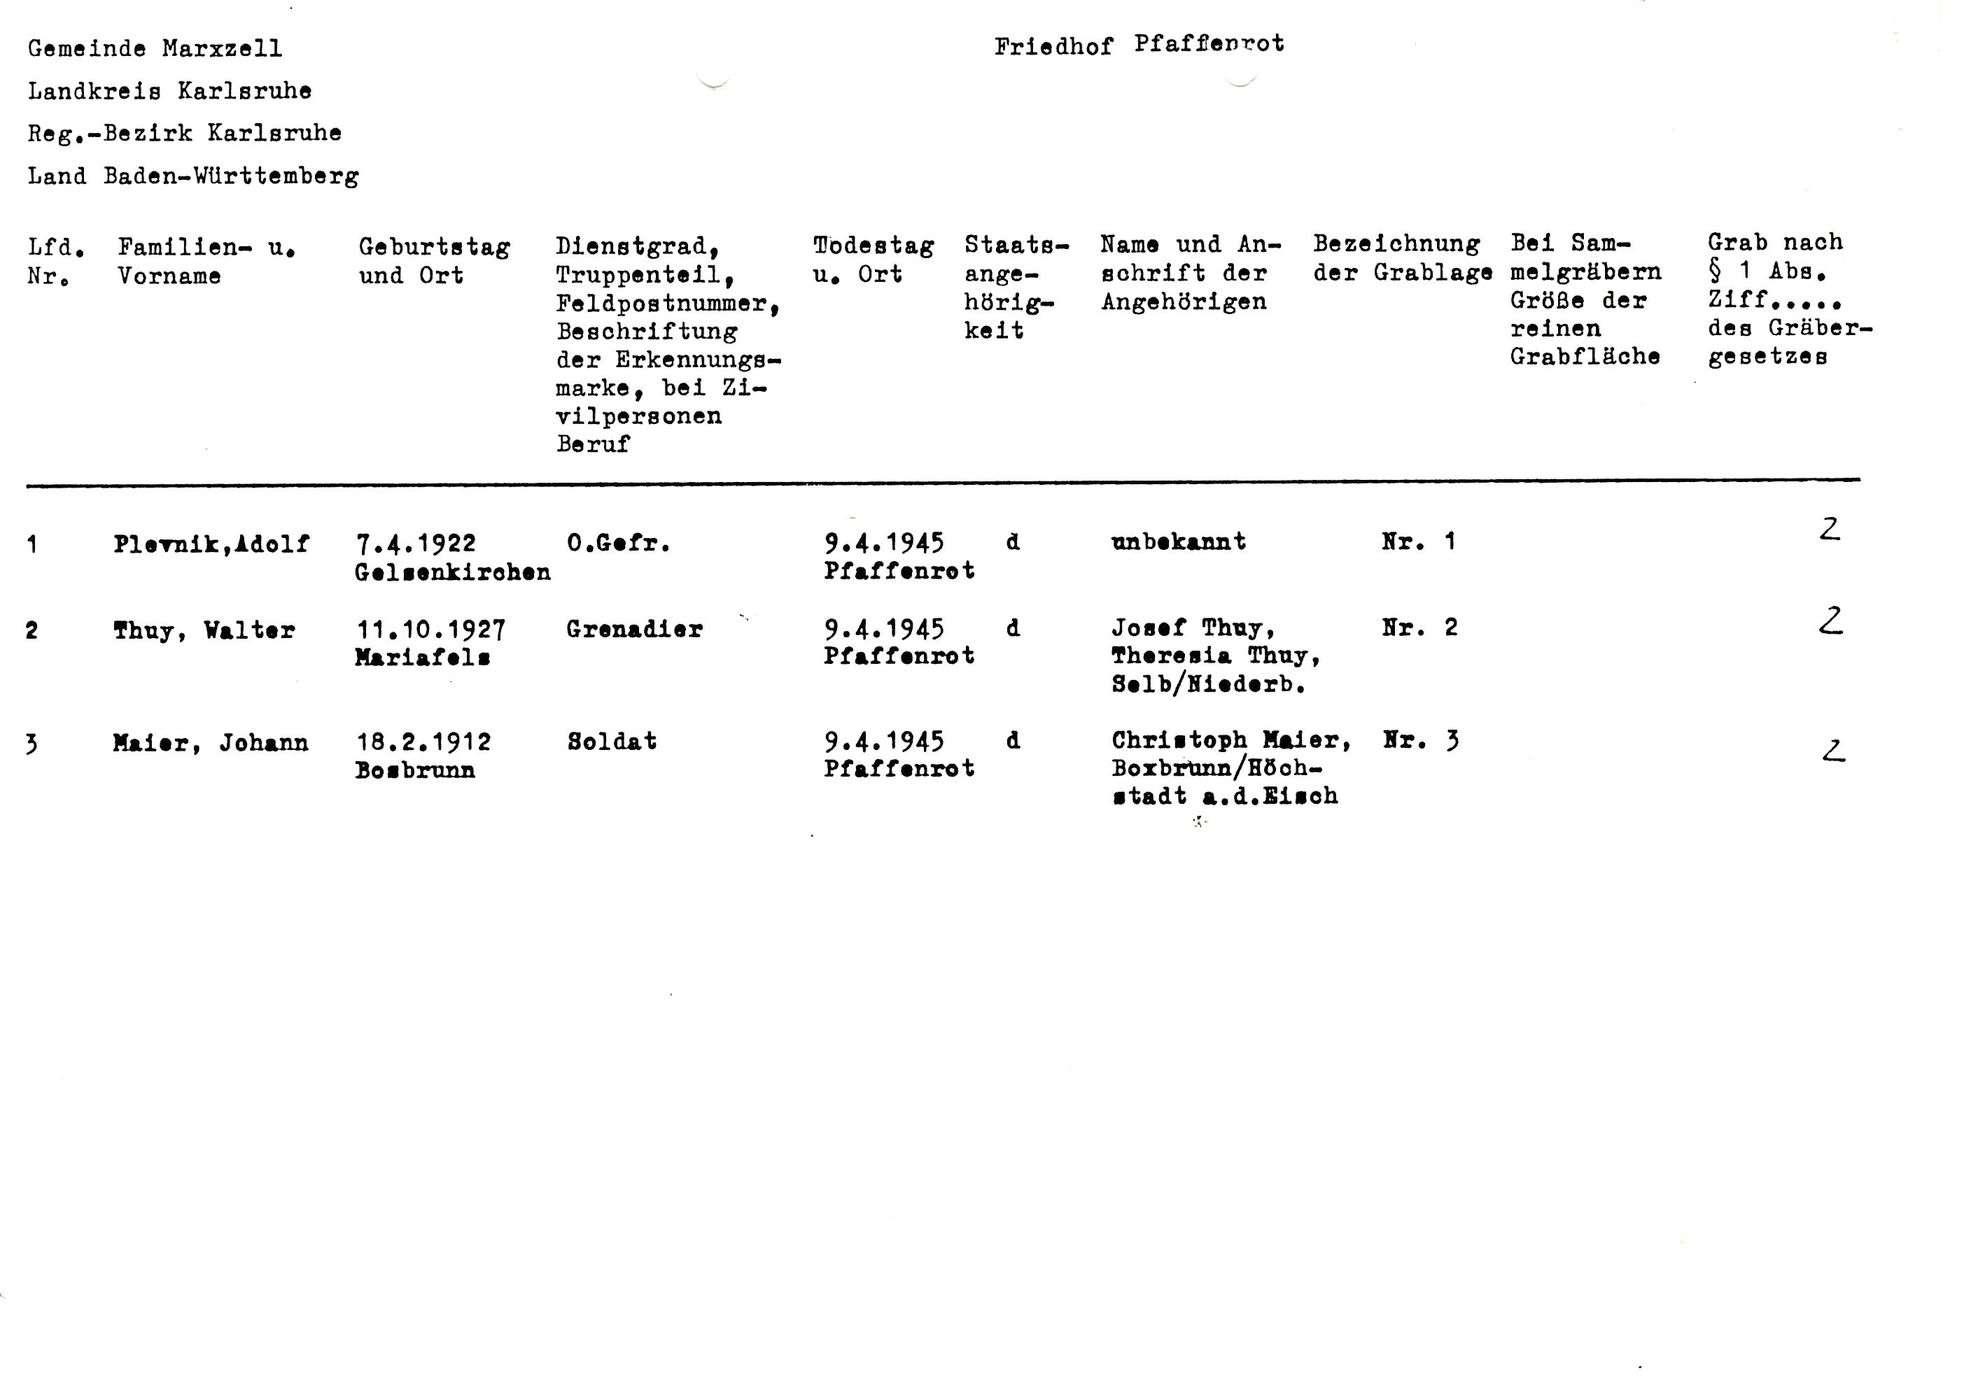 Pfaffenrot, Bild 2